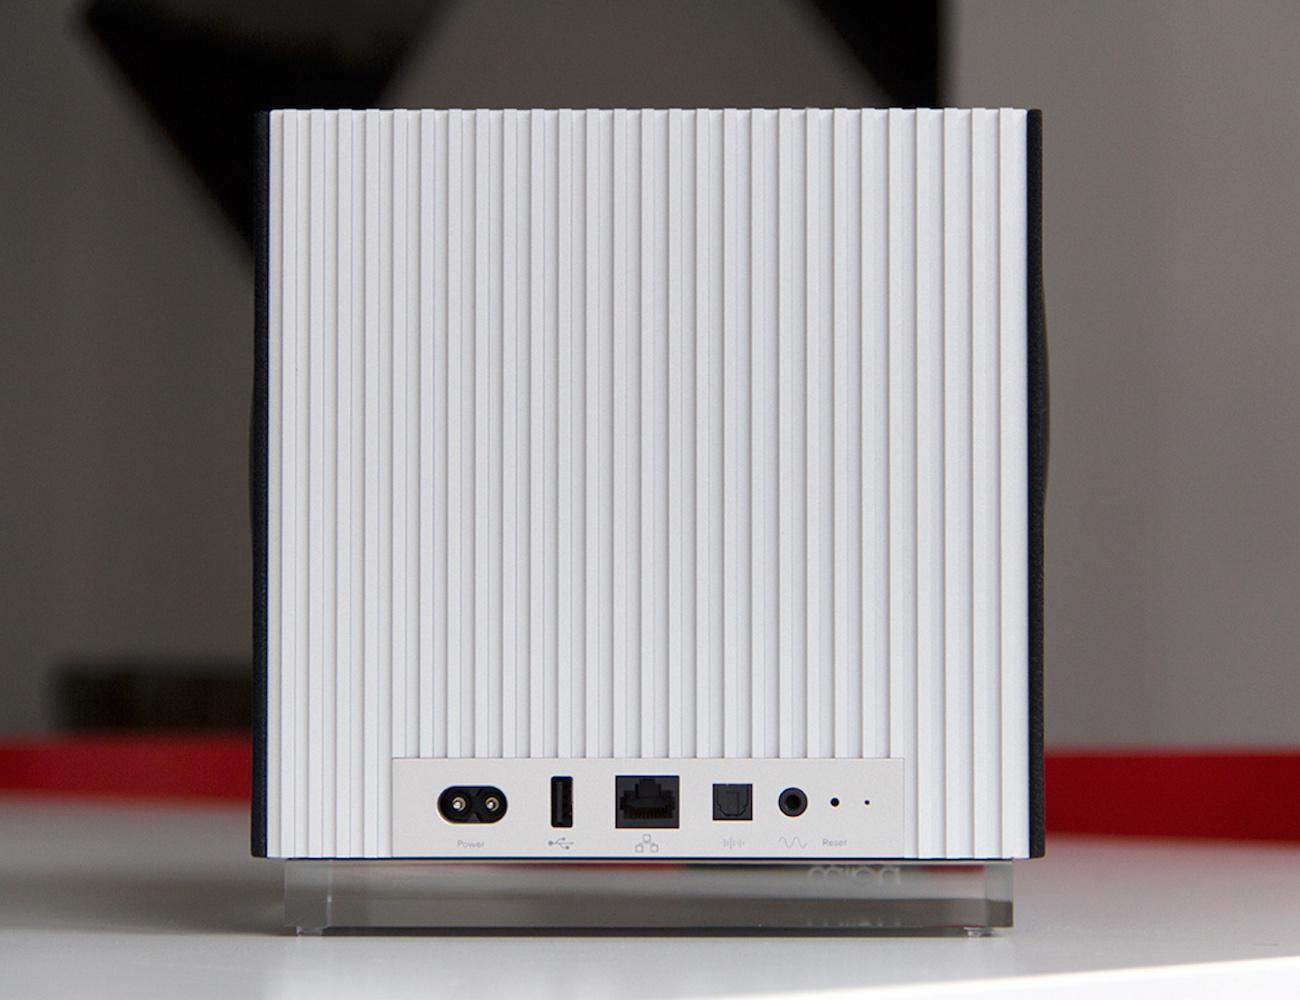 Mu-so Qb Wireless Music System by Naim Audio